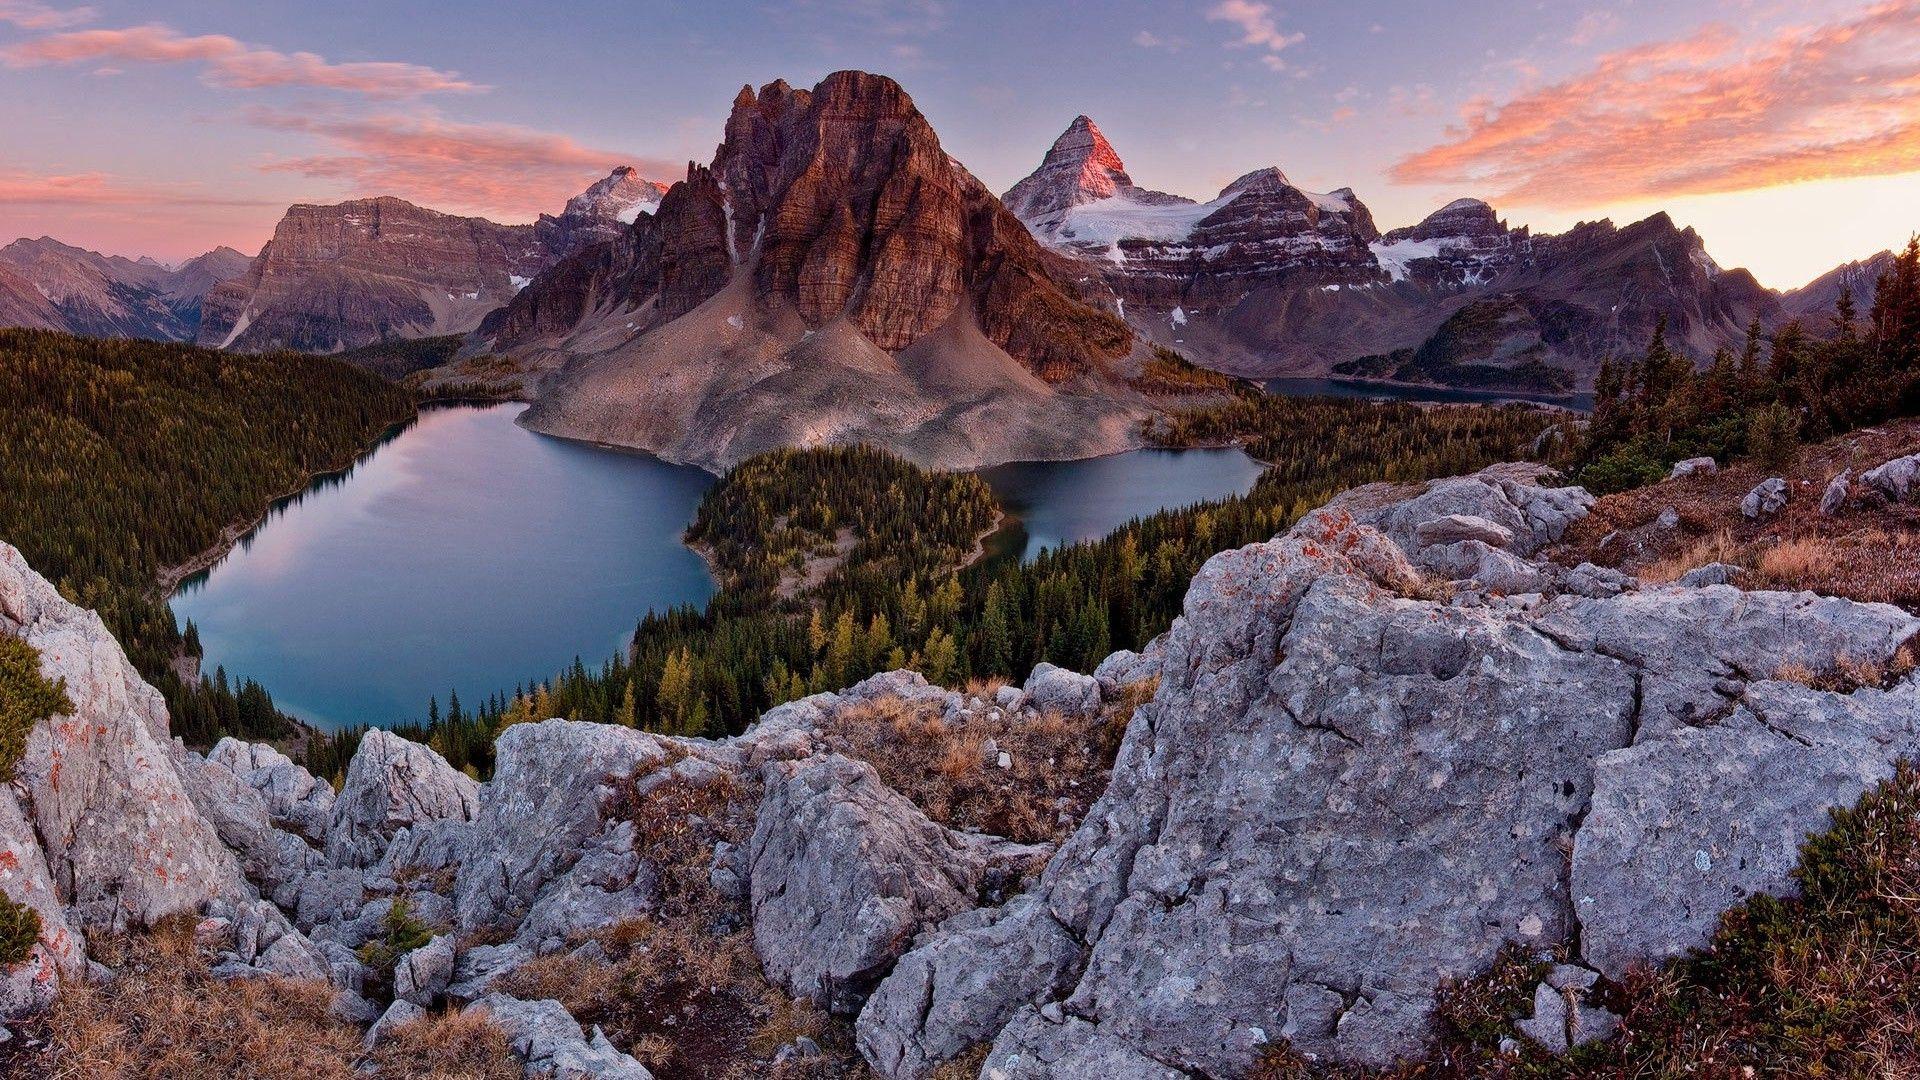 Rocky Mountain wallpaper background